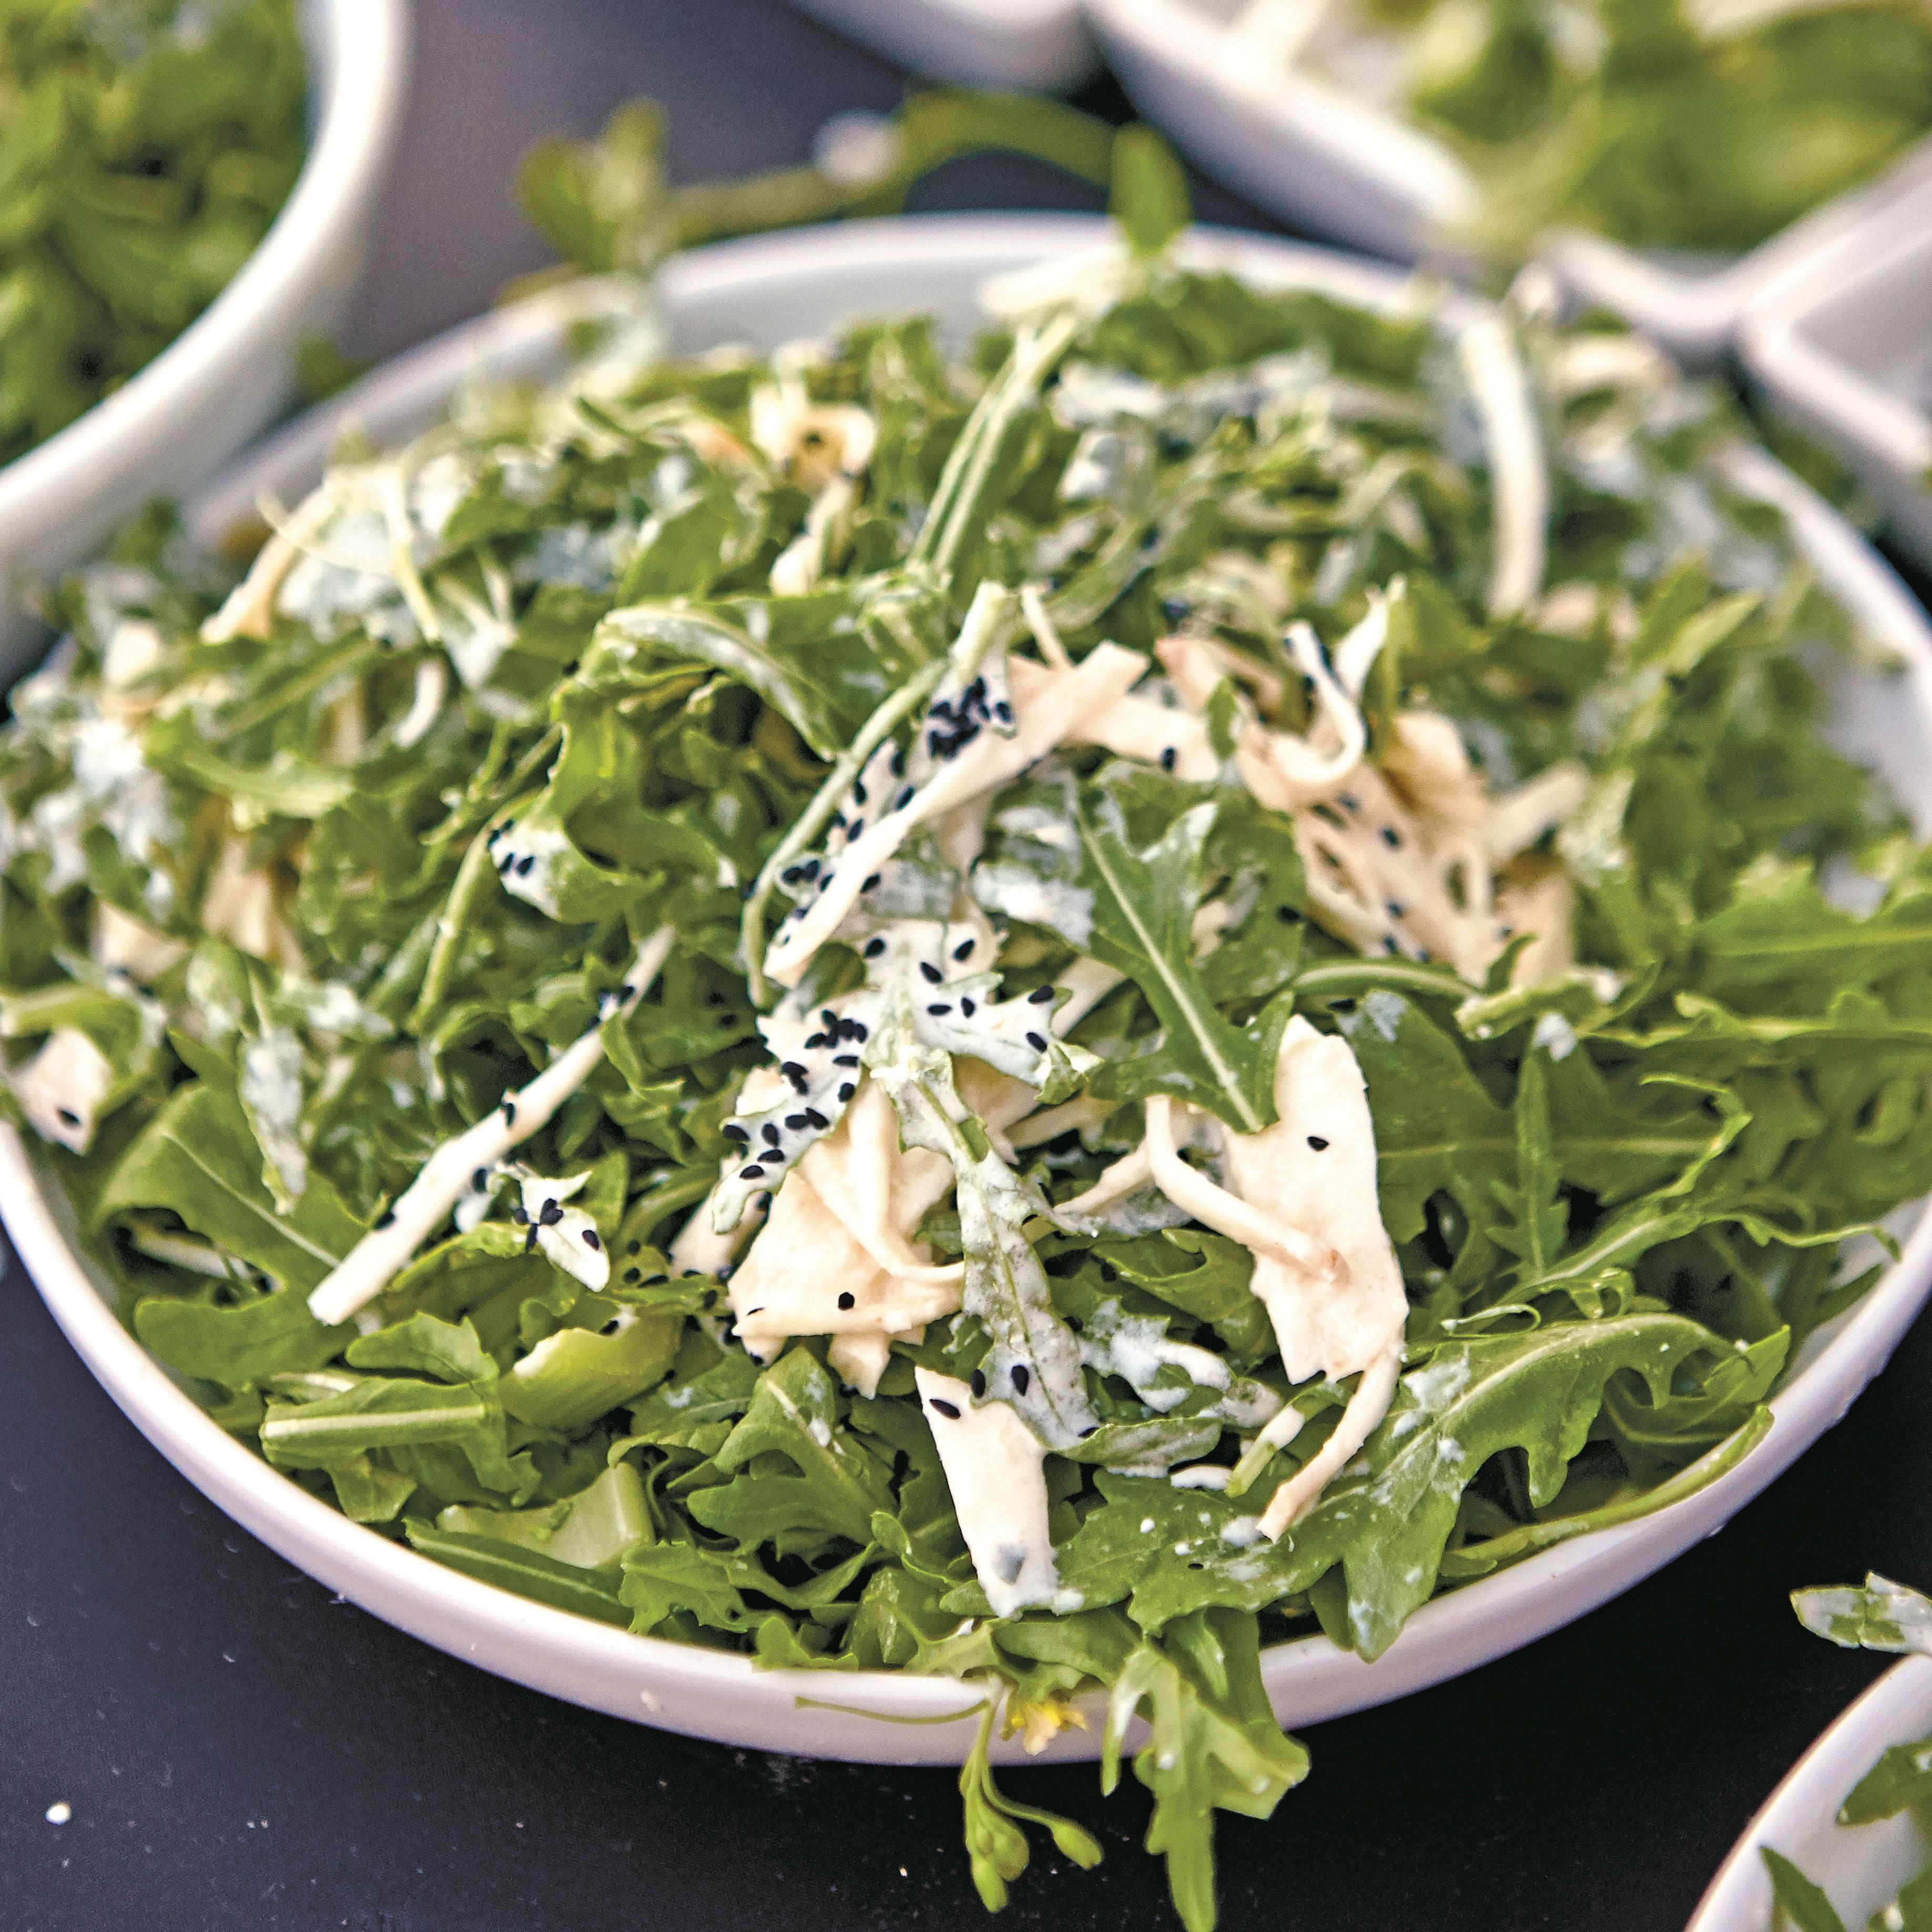 su-Celery Root Arugula Salad with Horseradish Dressing Image